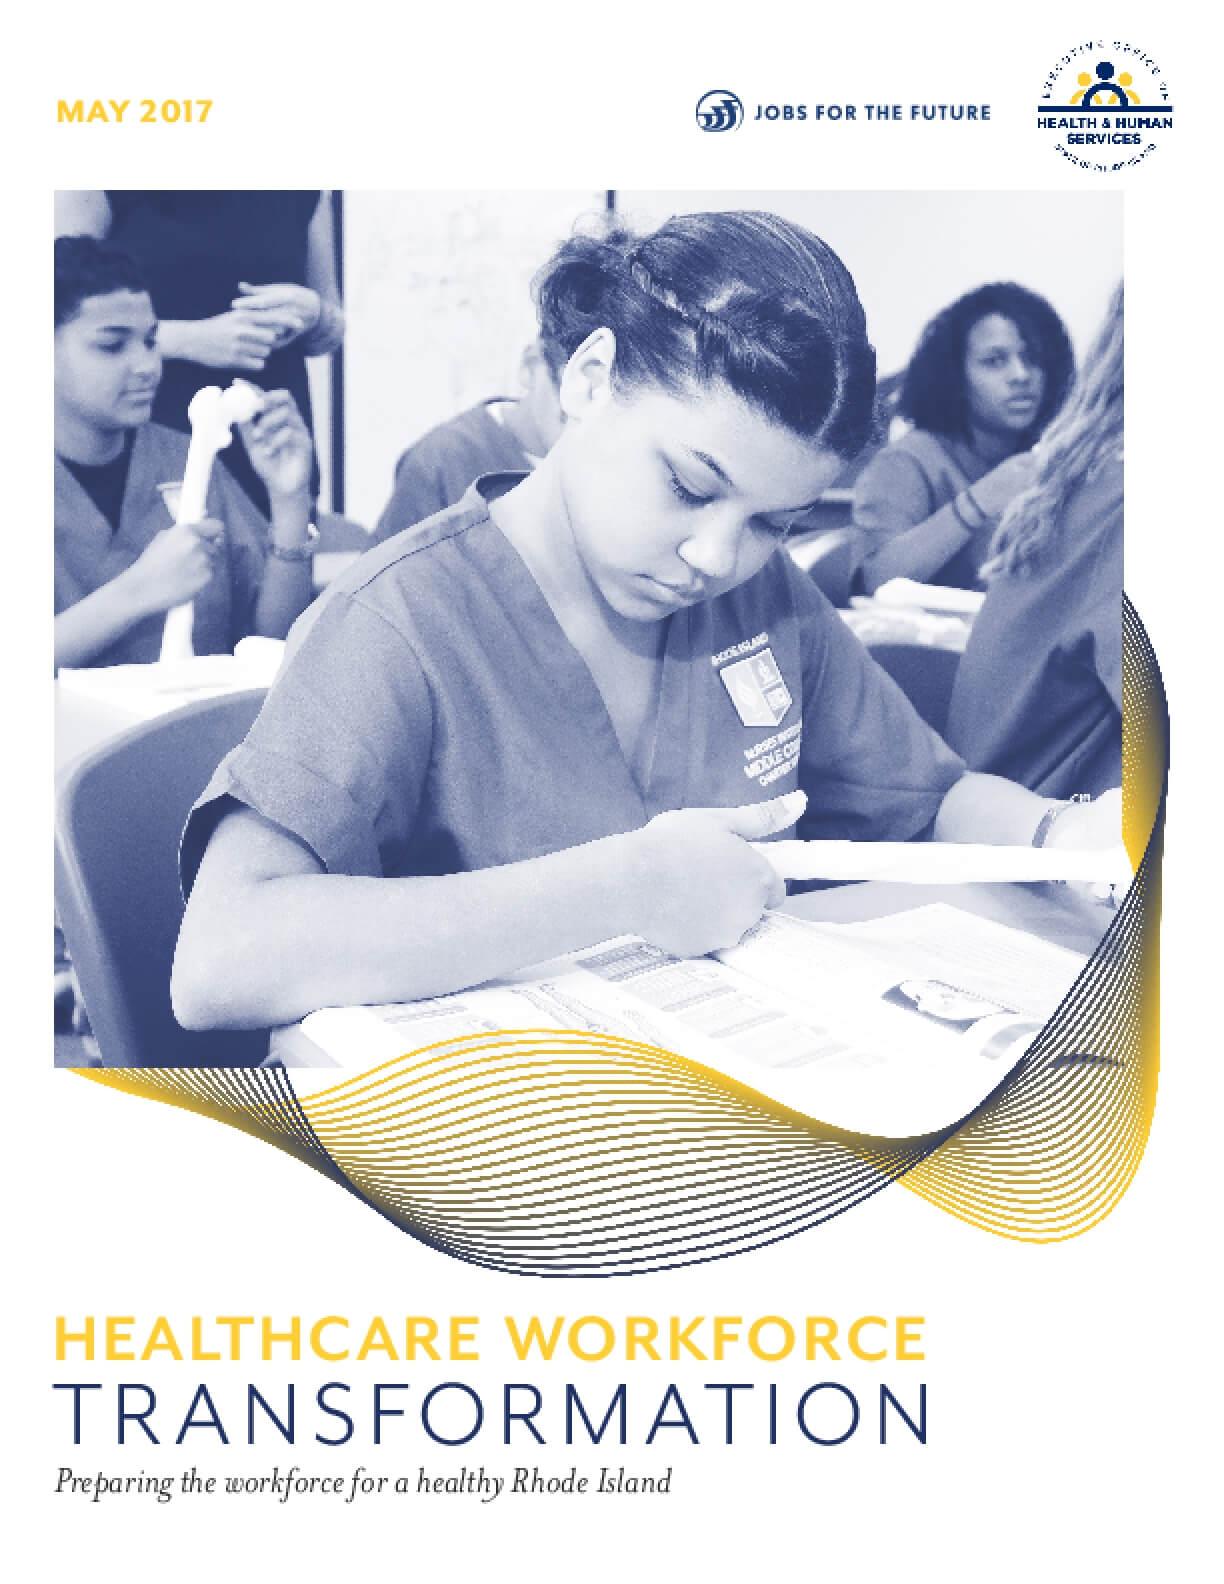 Healthcare Workforce Transformation: Preparing the Workforce for a Healthy Rhode Island